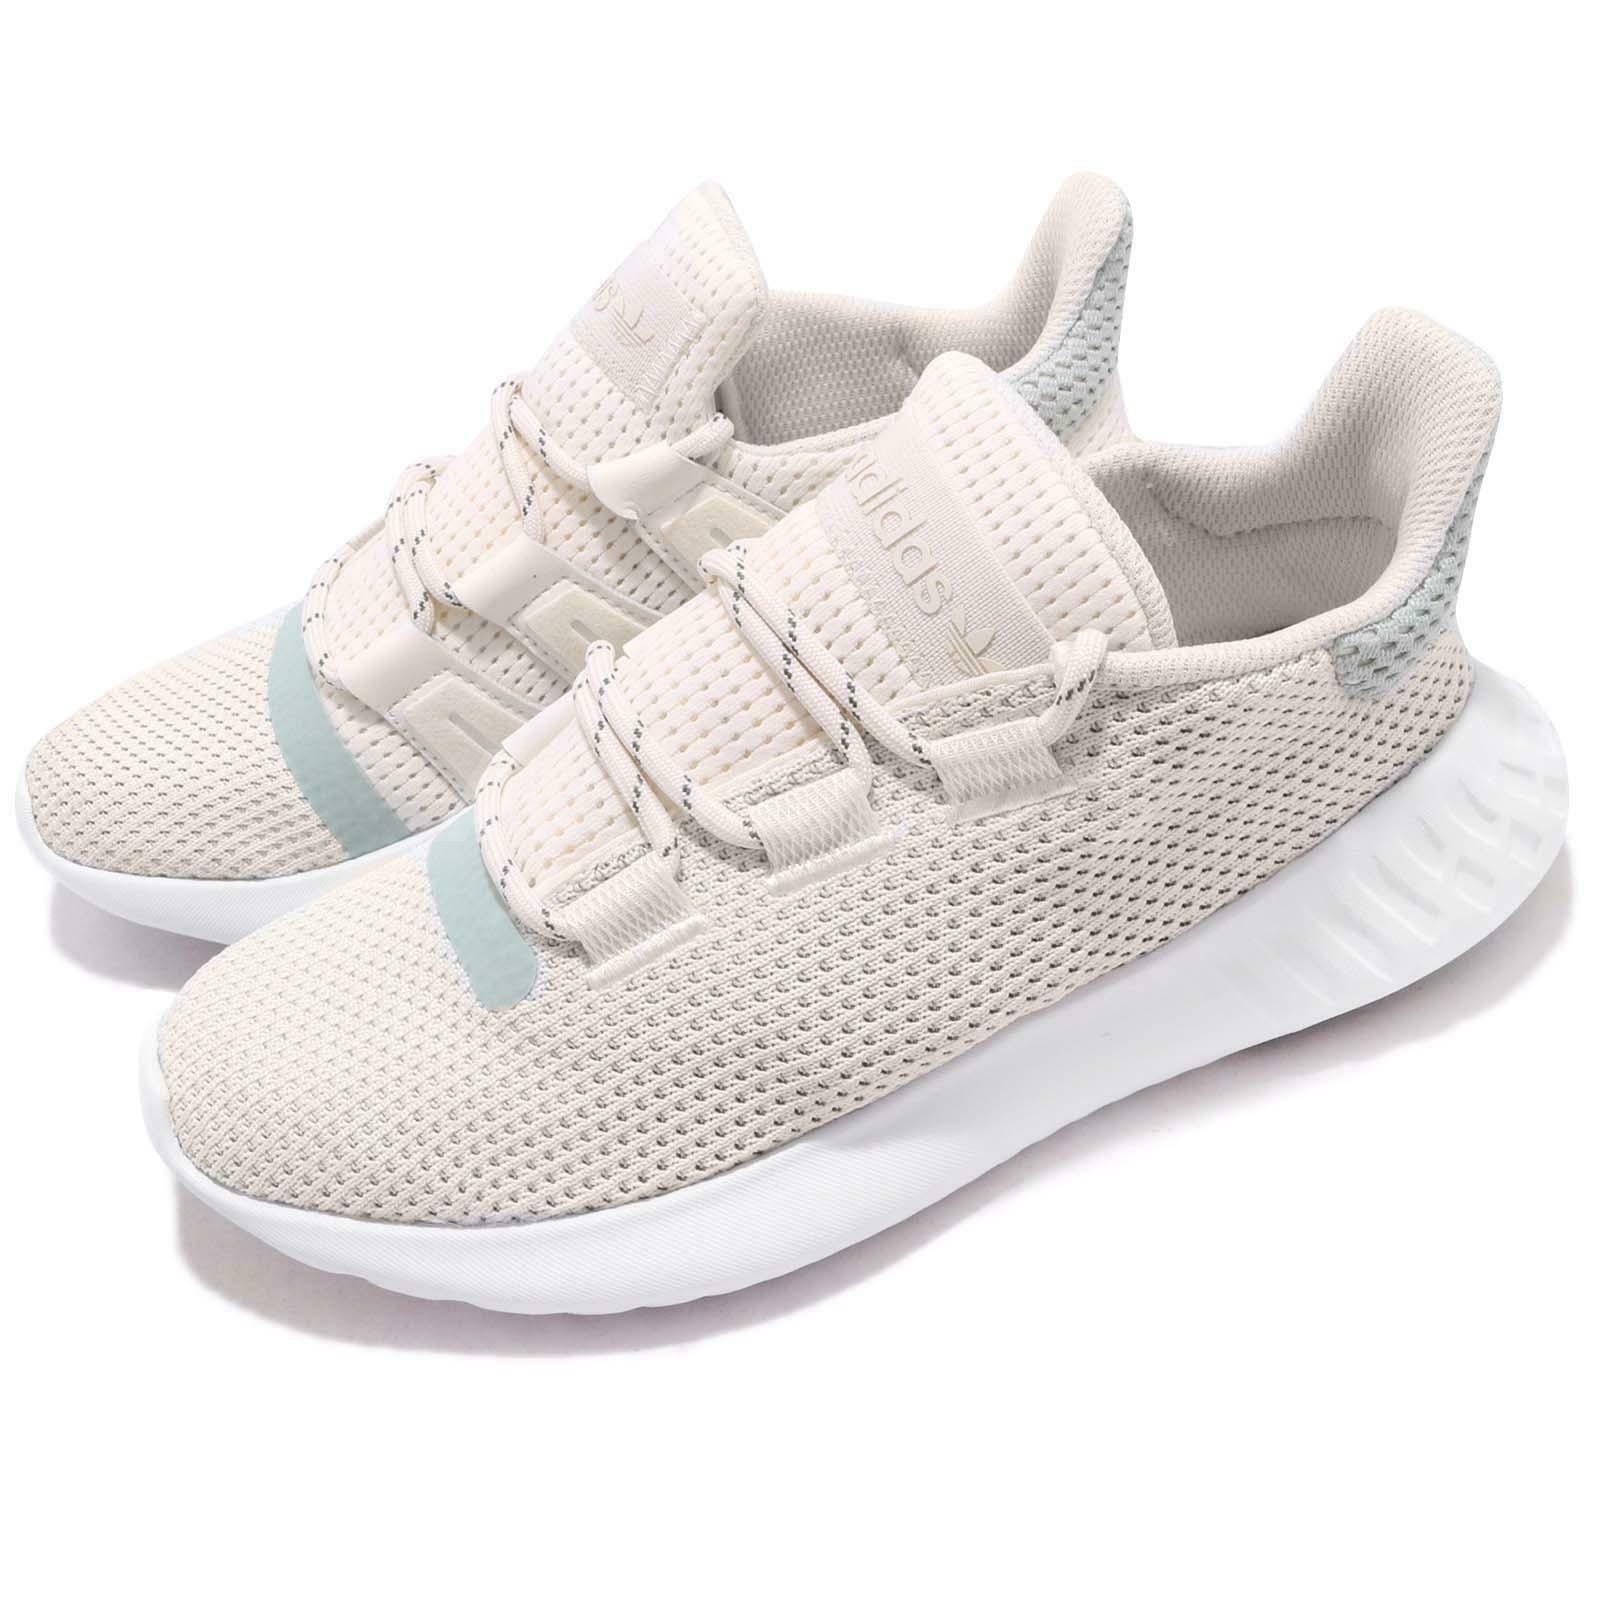 Adidas Originals Tubular Dusk Running Women's Chalk White (B37765)Size:US 8.5